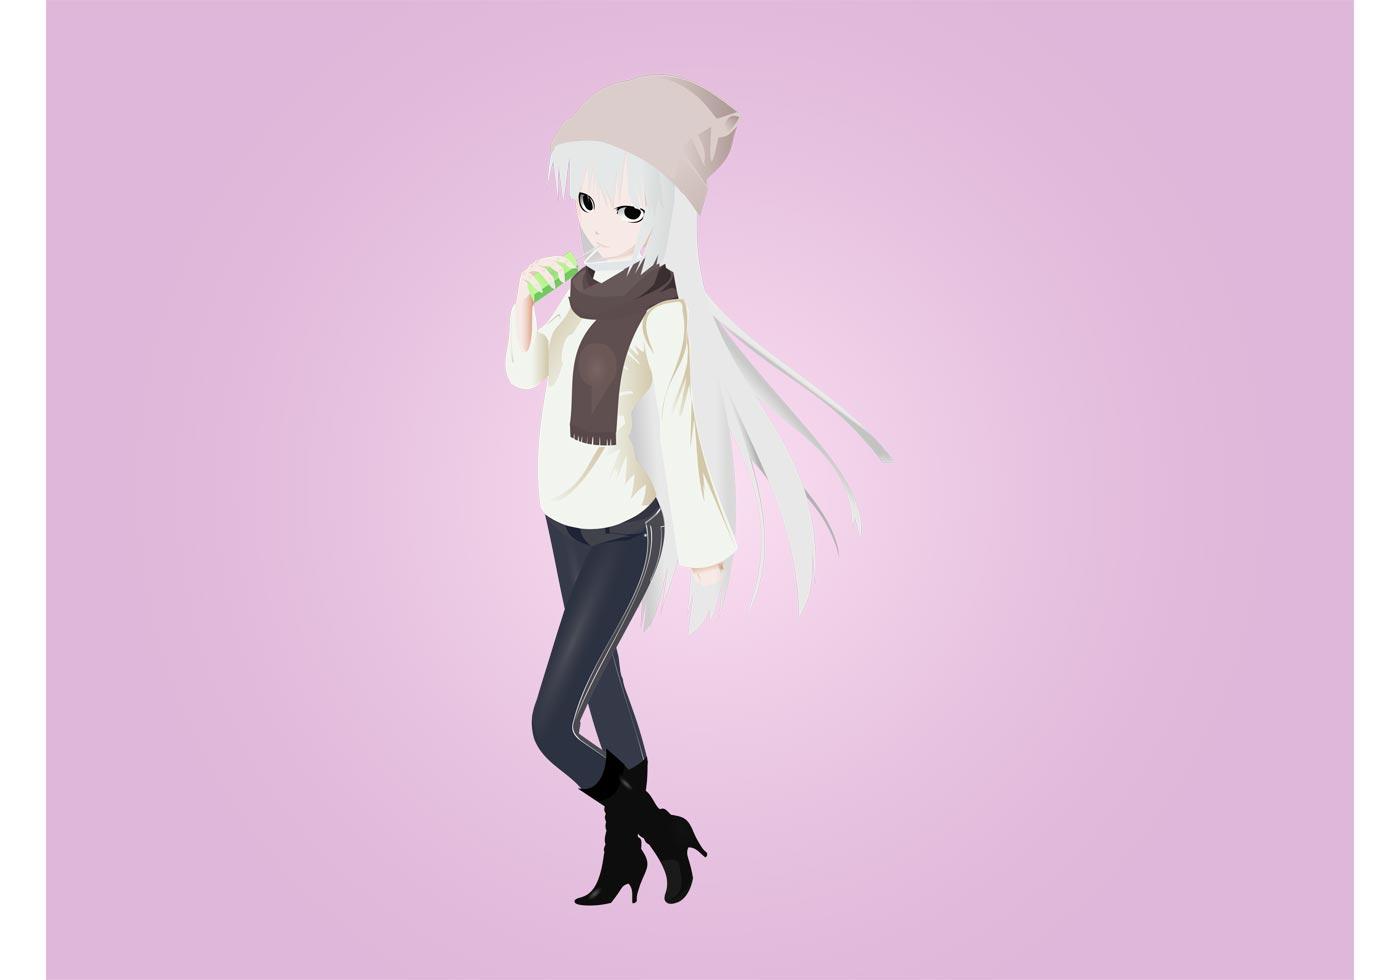 Cute Manga Girl Download Free Vector Art Stock Graphics